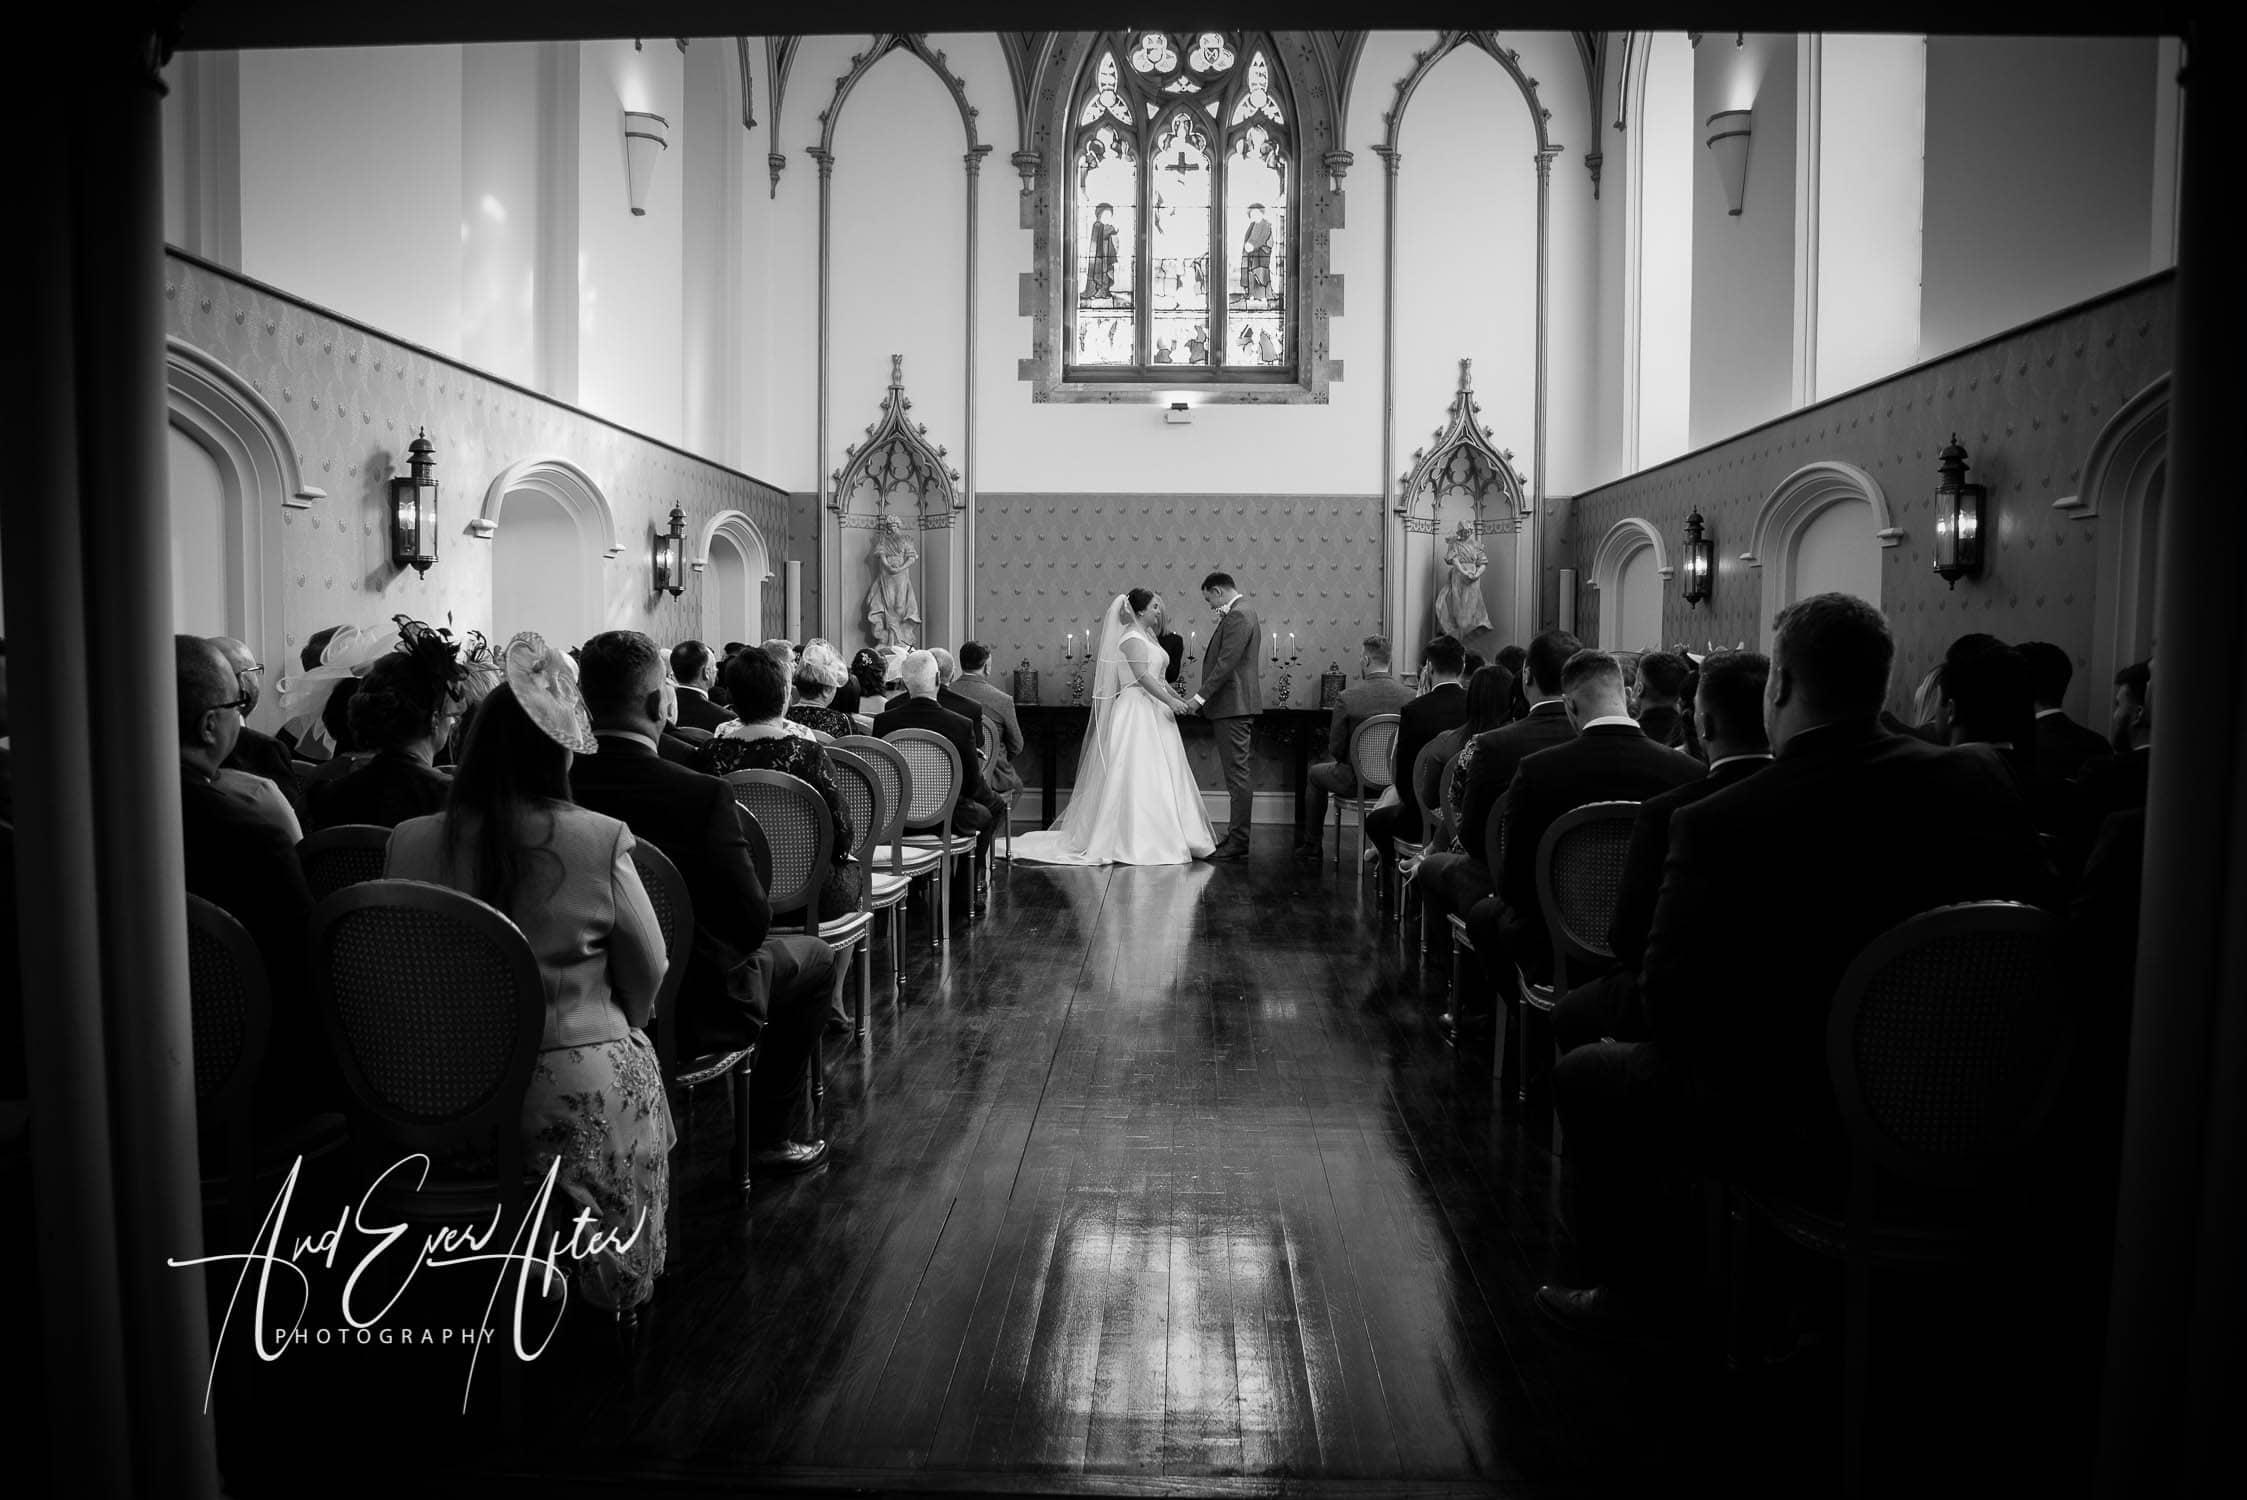 lartington hall, wedding chapel